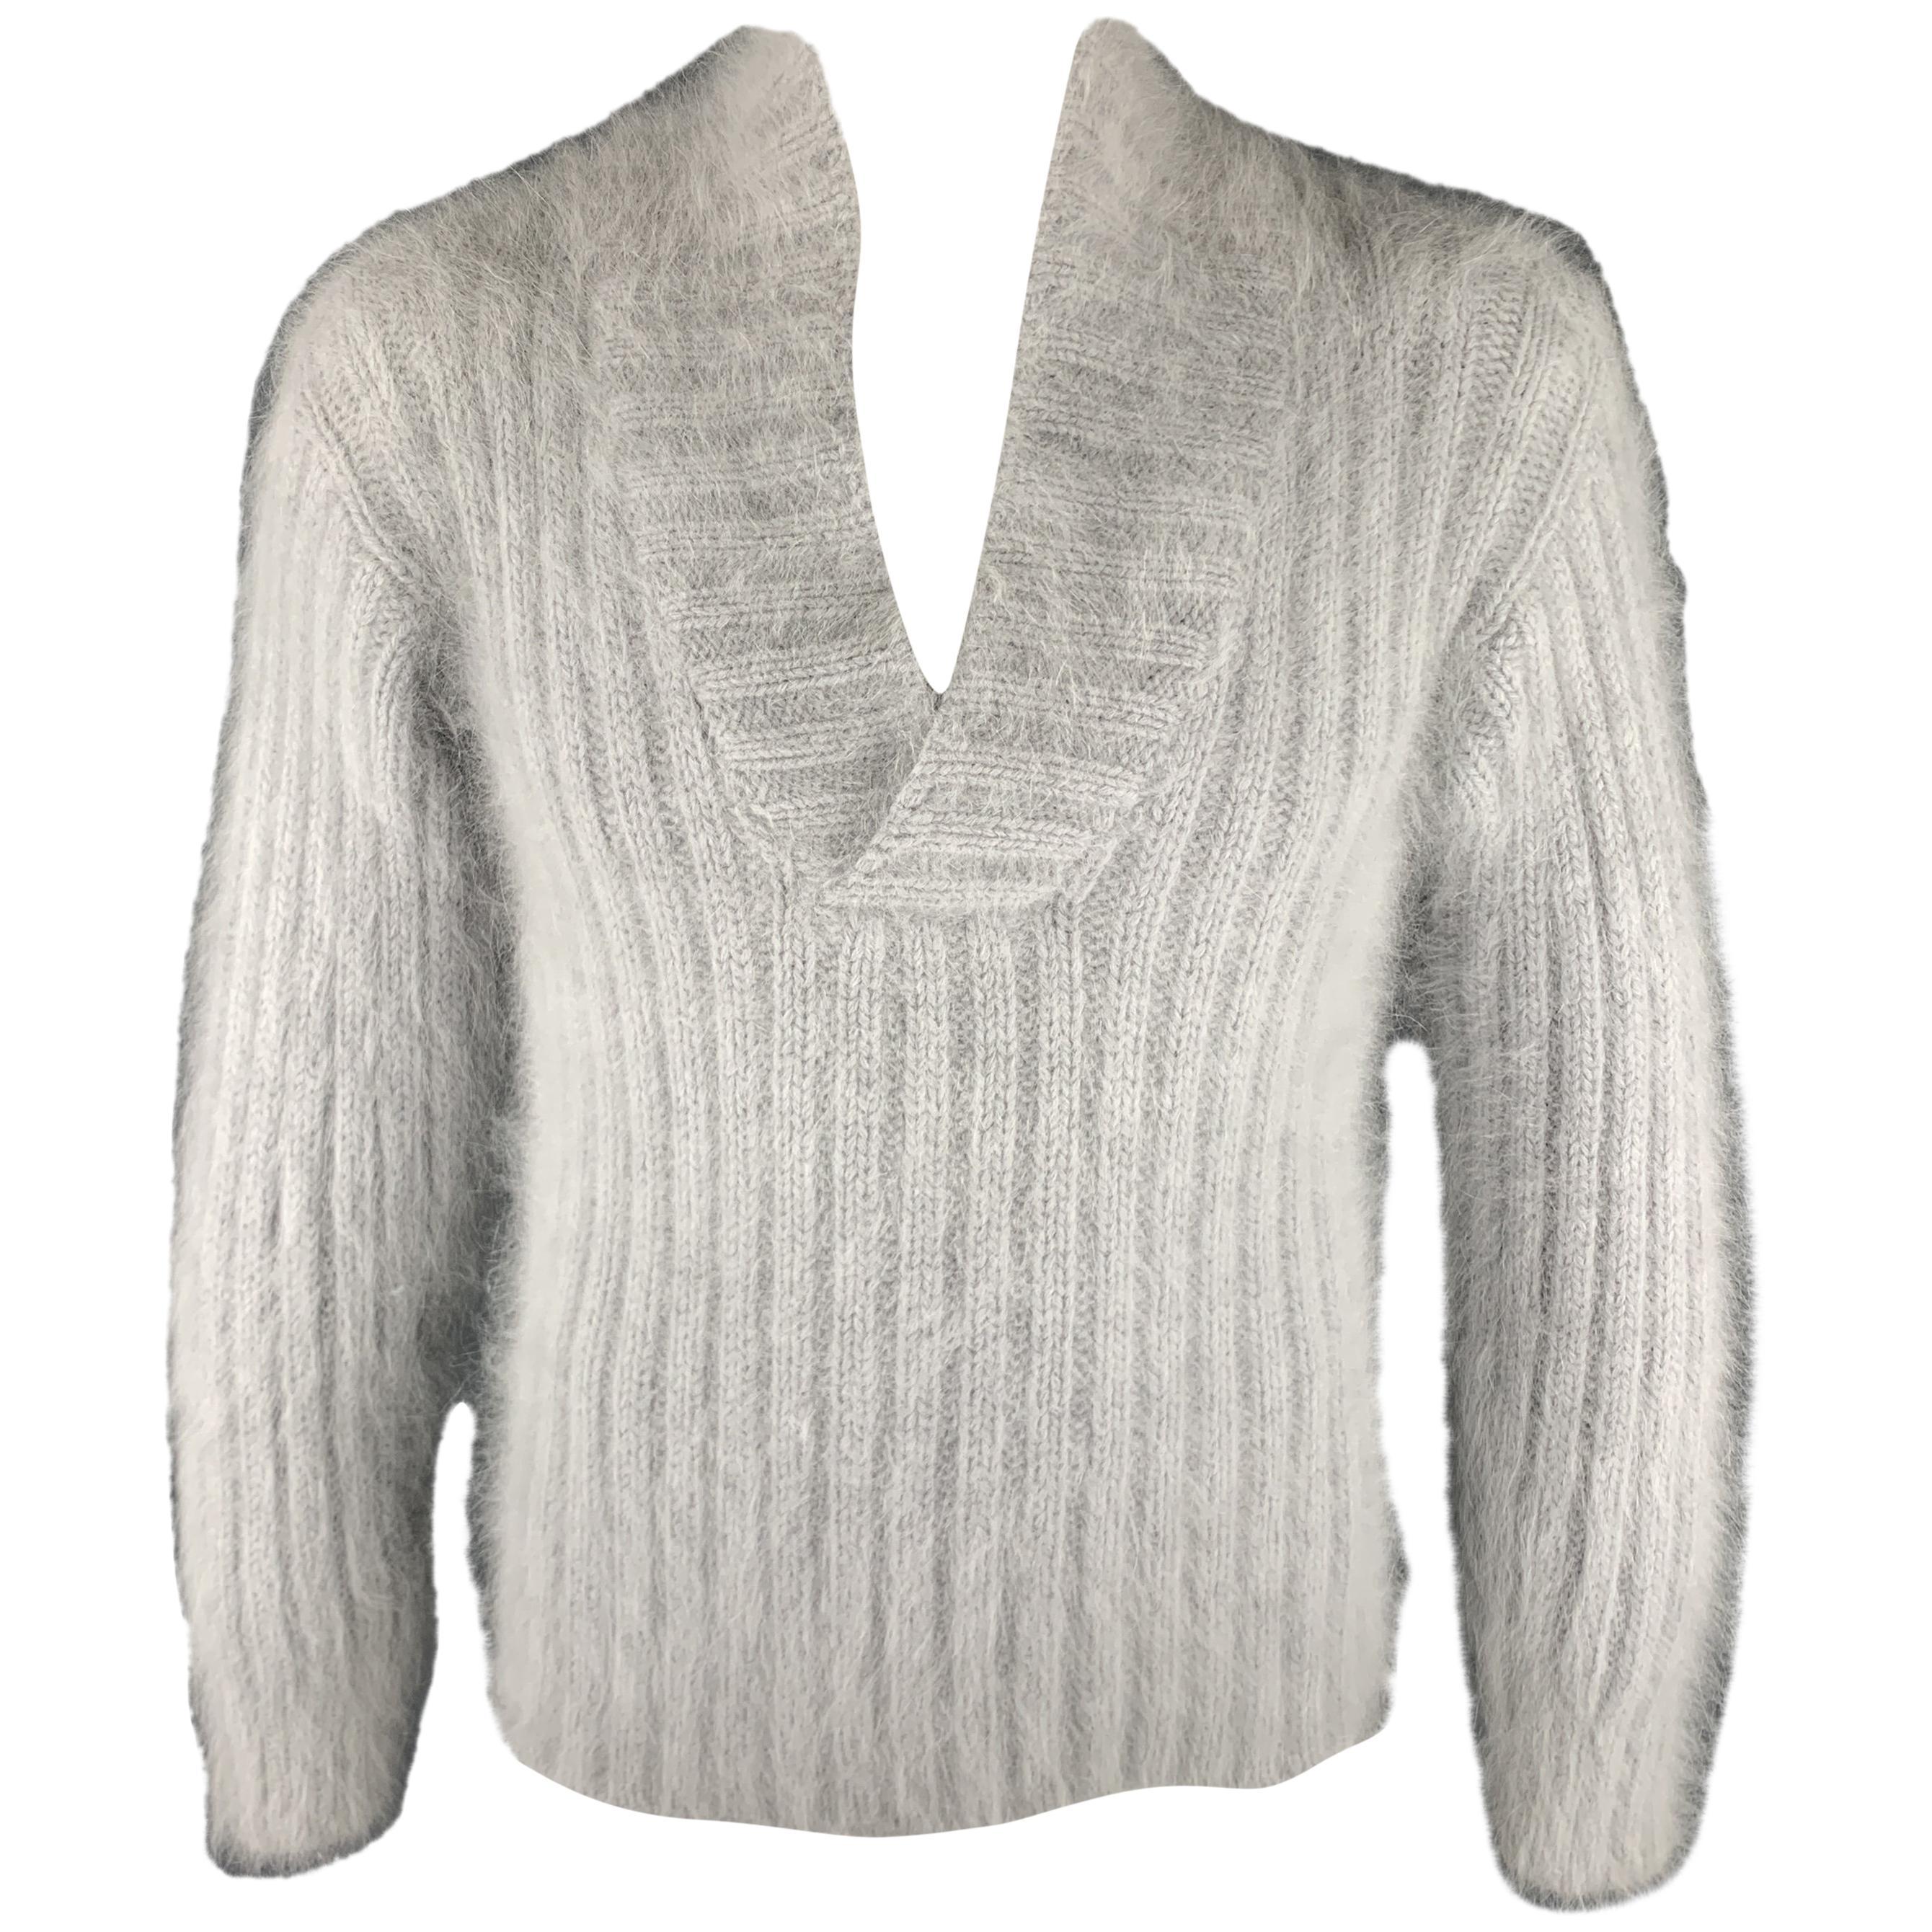 3b8423916 Vintage and Designer Sweaters - 1